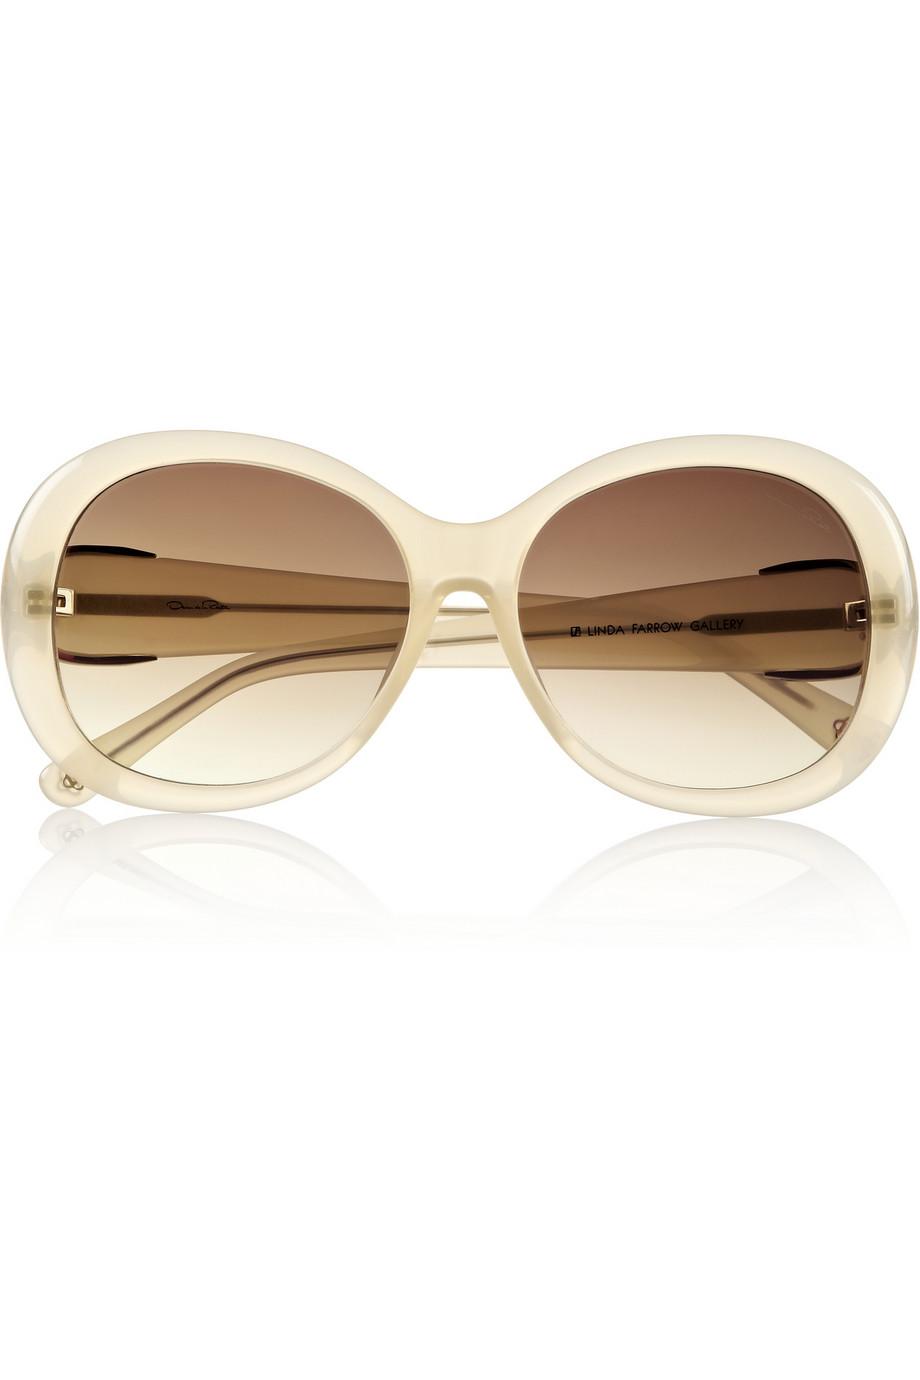 Round-frame acetate sunglasses | Oscar de la Renta | THE OUTNET